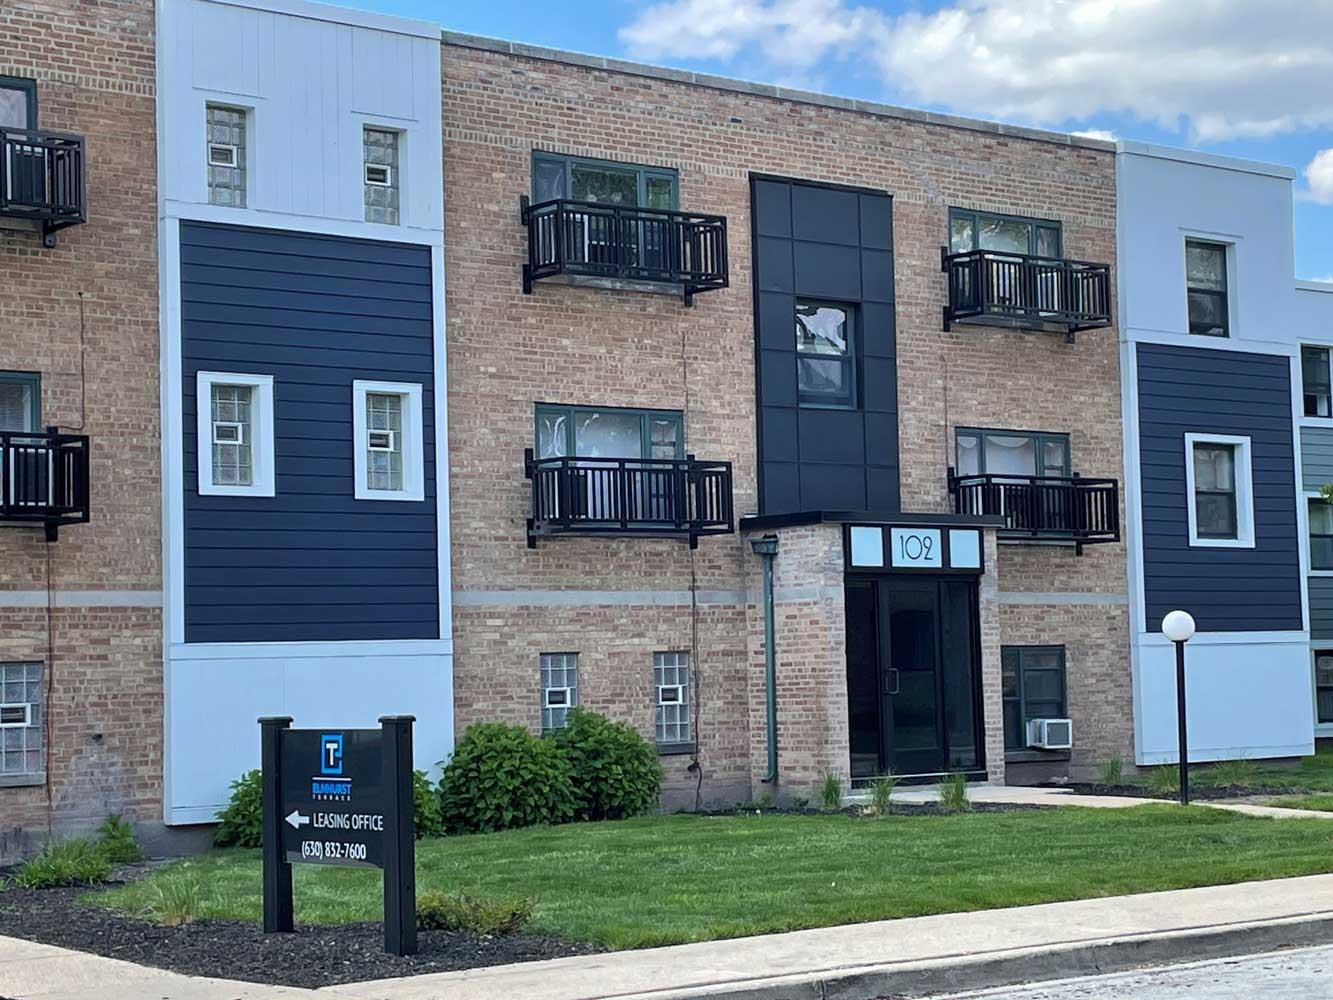 Exterior View at Elmhurst Terrace Apartments in Elmhurst, Illinois